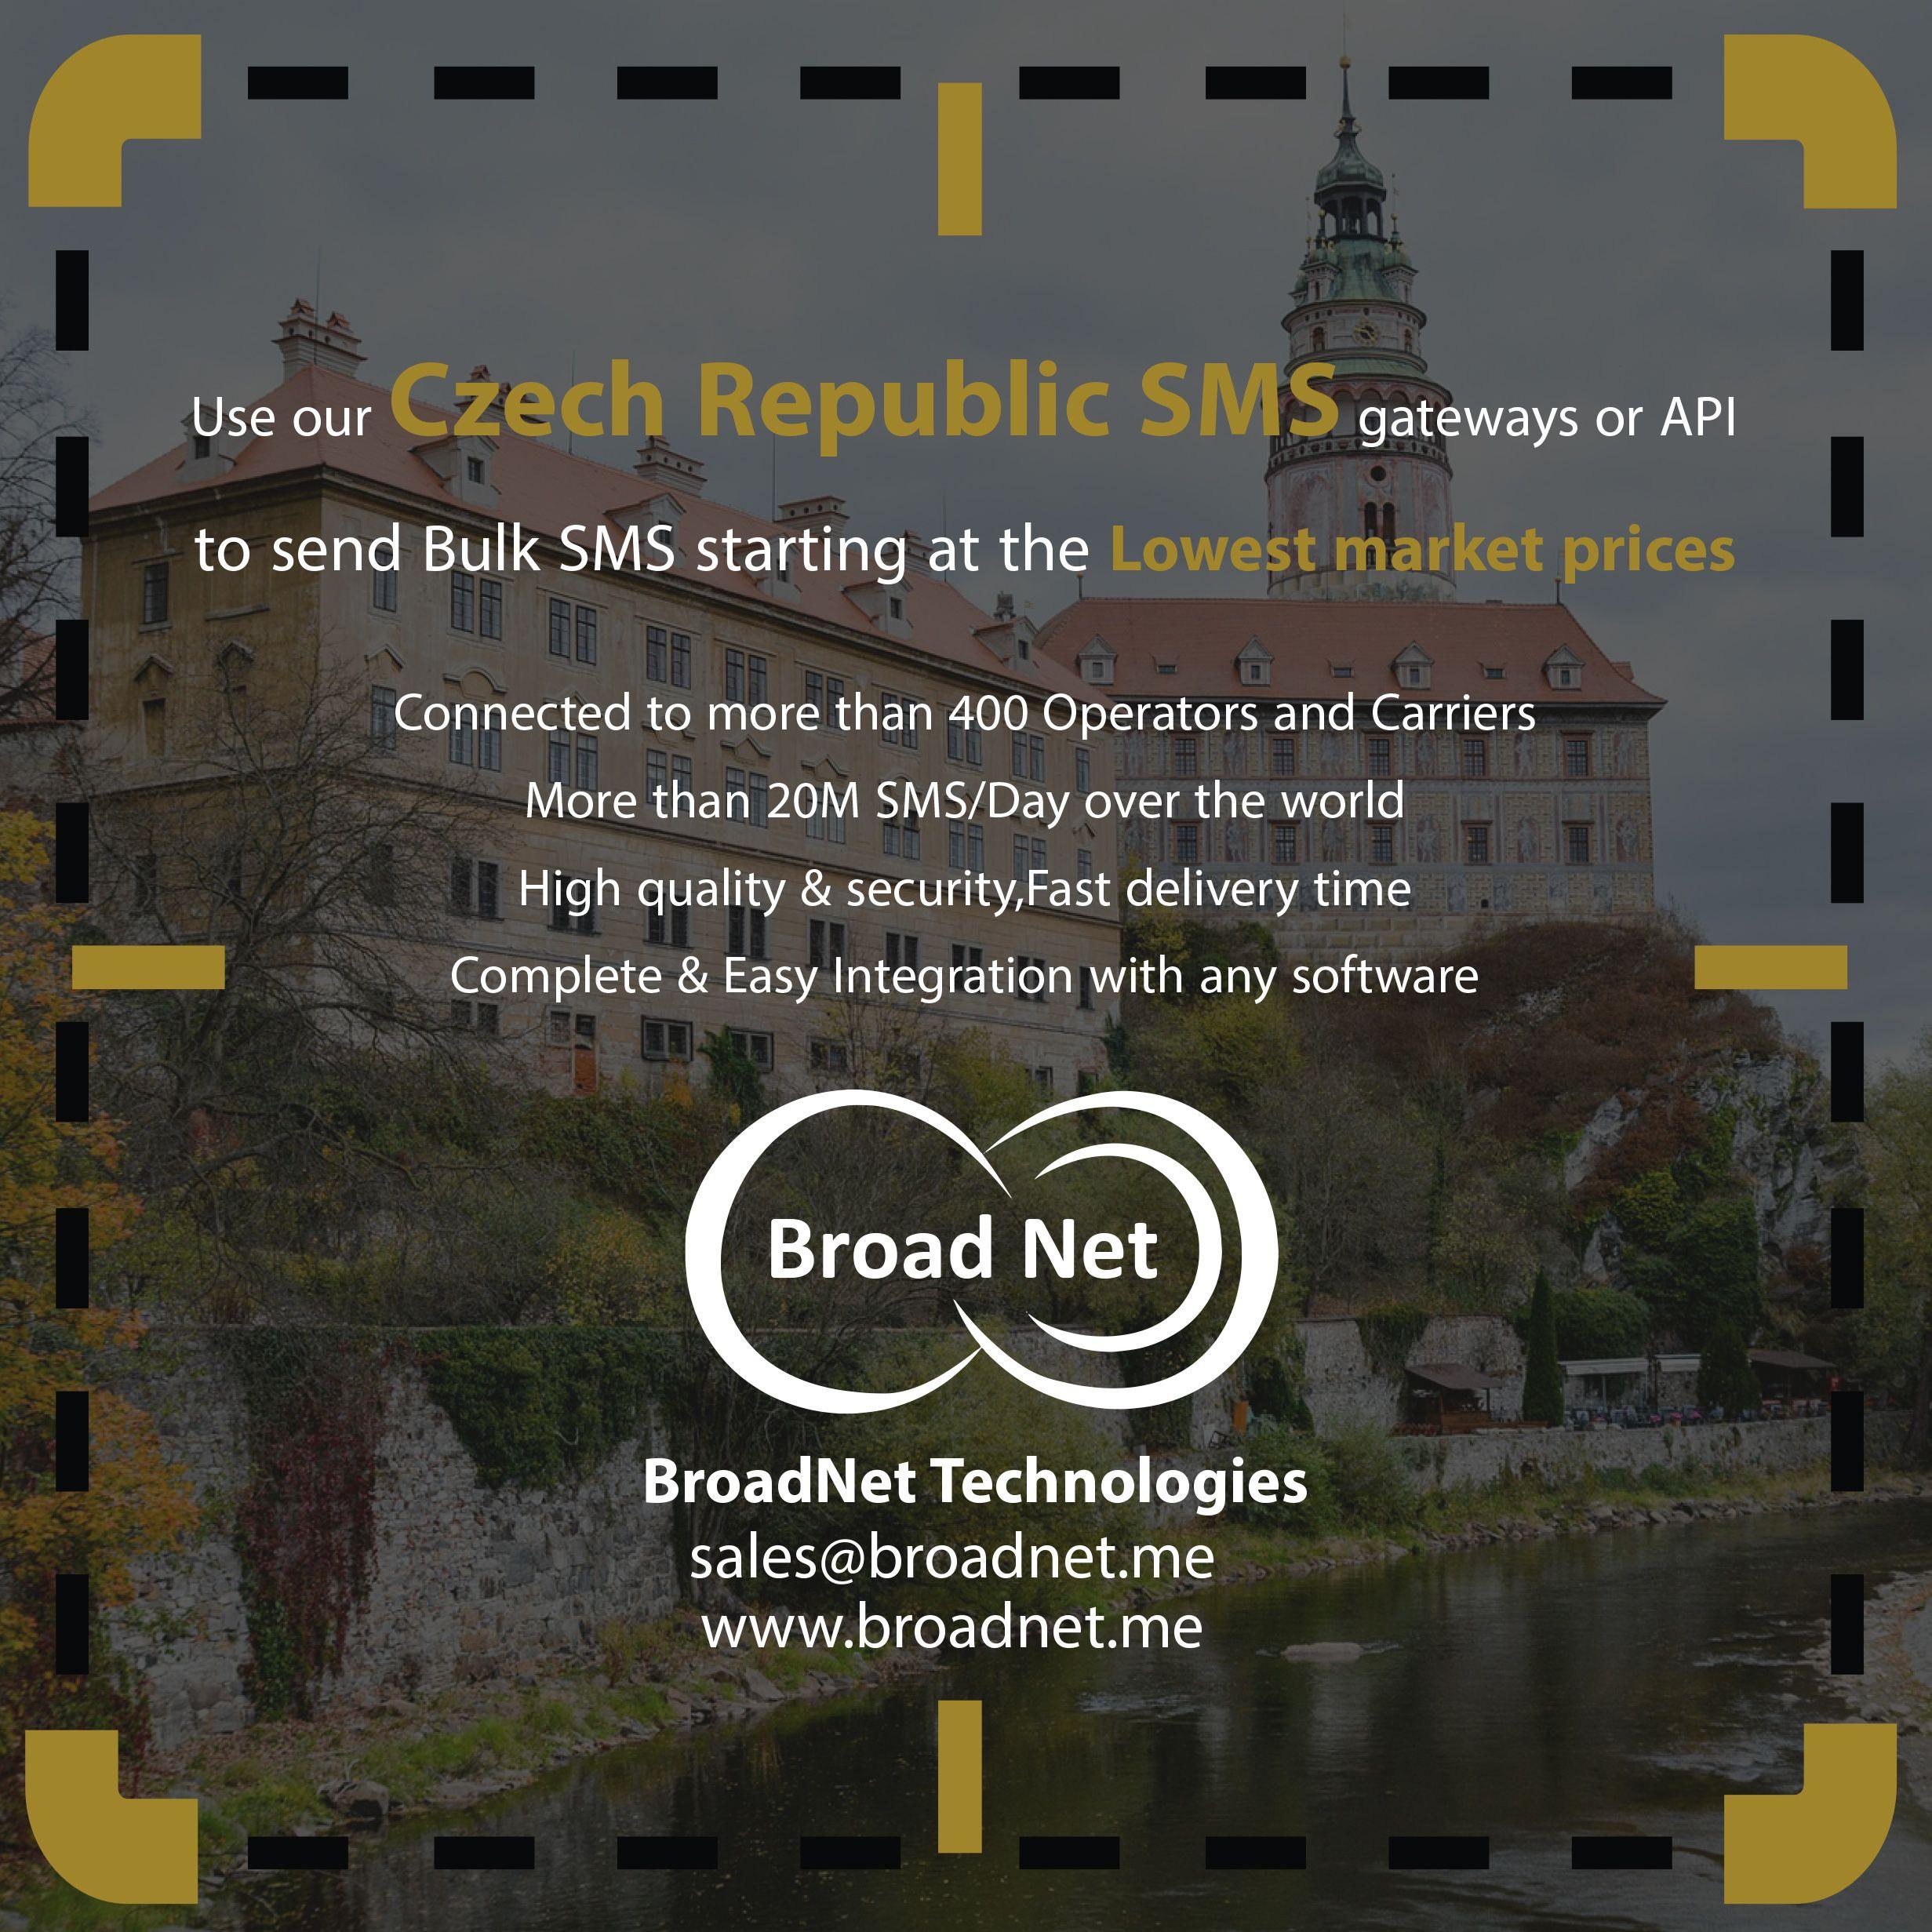 Use our Czech Republic SMS gateways or #API to send Bulk SMS